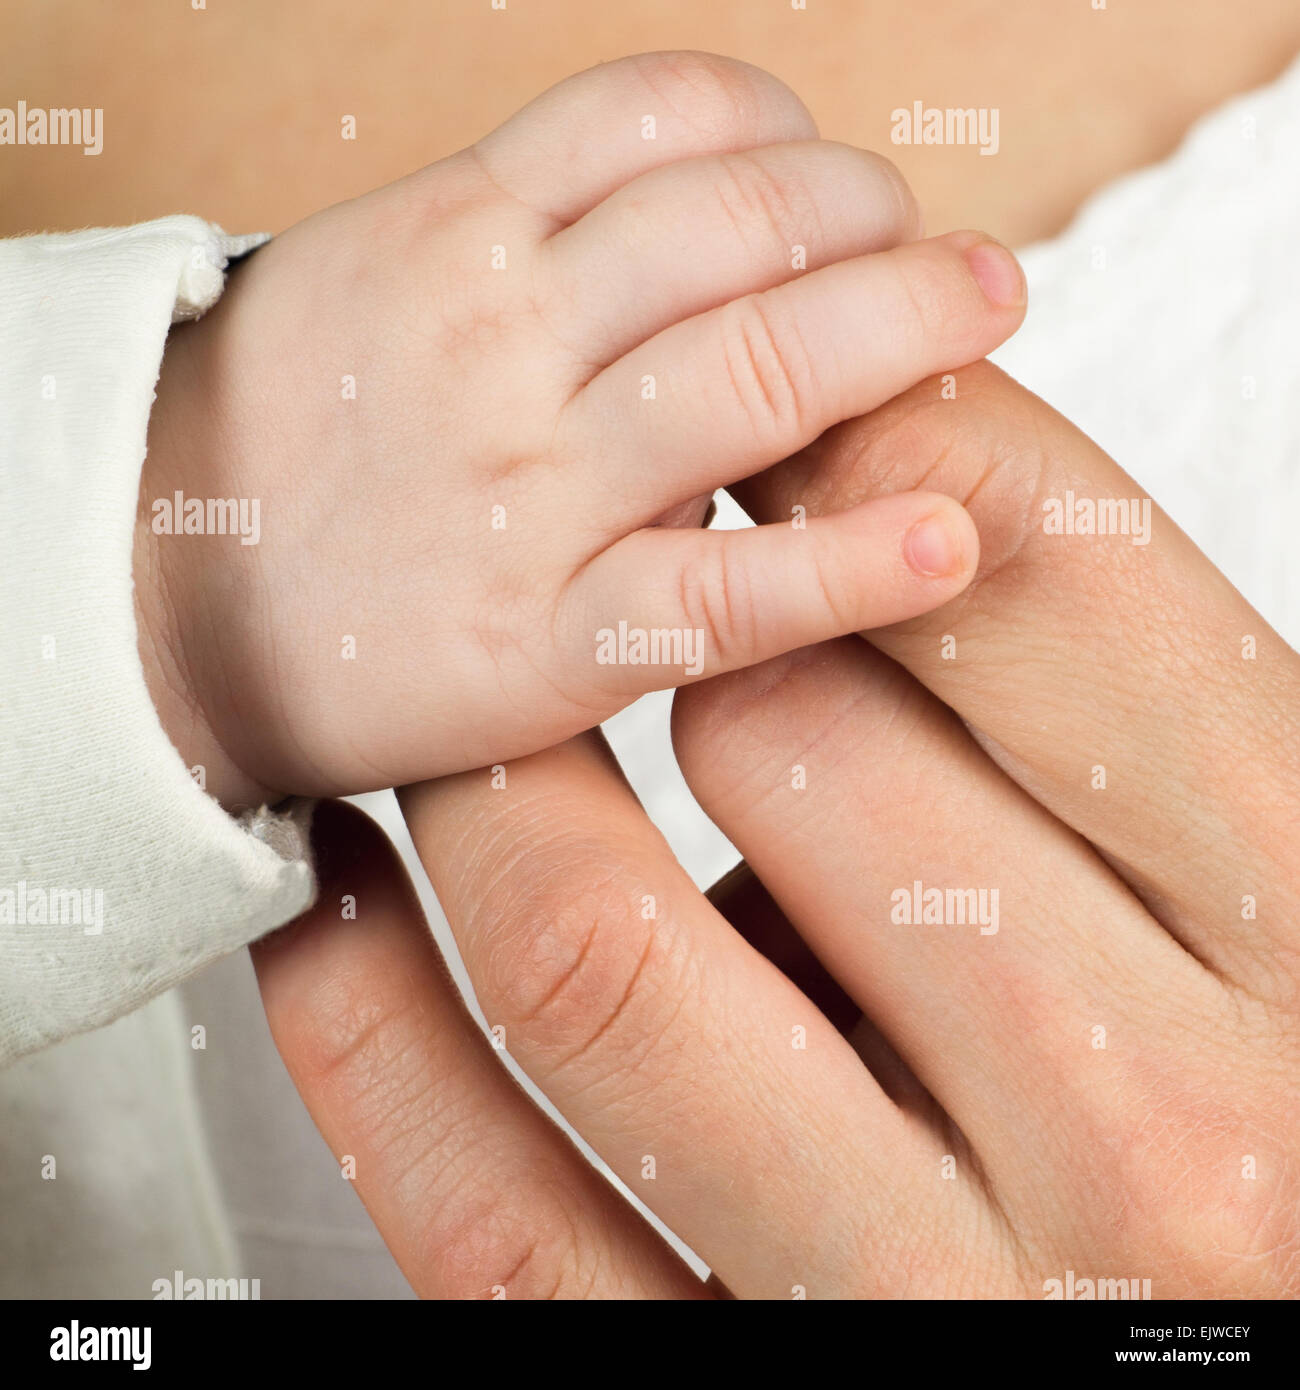 Niño mano sujetando el dedo mom Imagen De Stock